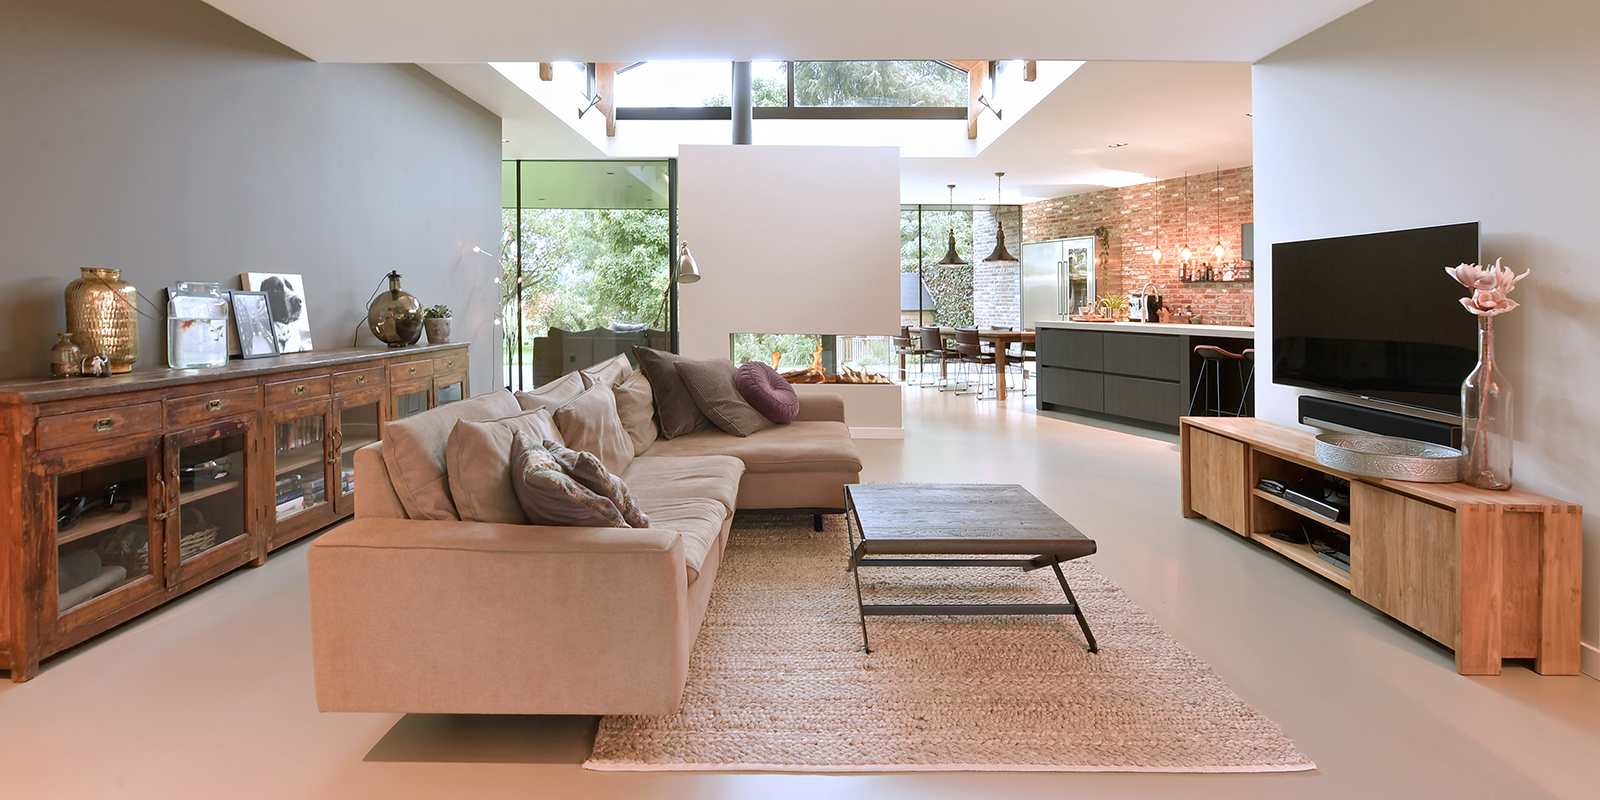 Betonlook gietvloer | DRT vloeren, betonvloer, betonlook, licht beton, veel lichtinval, villa